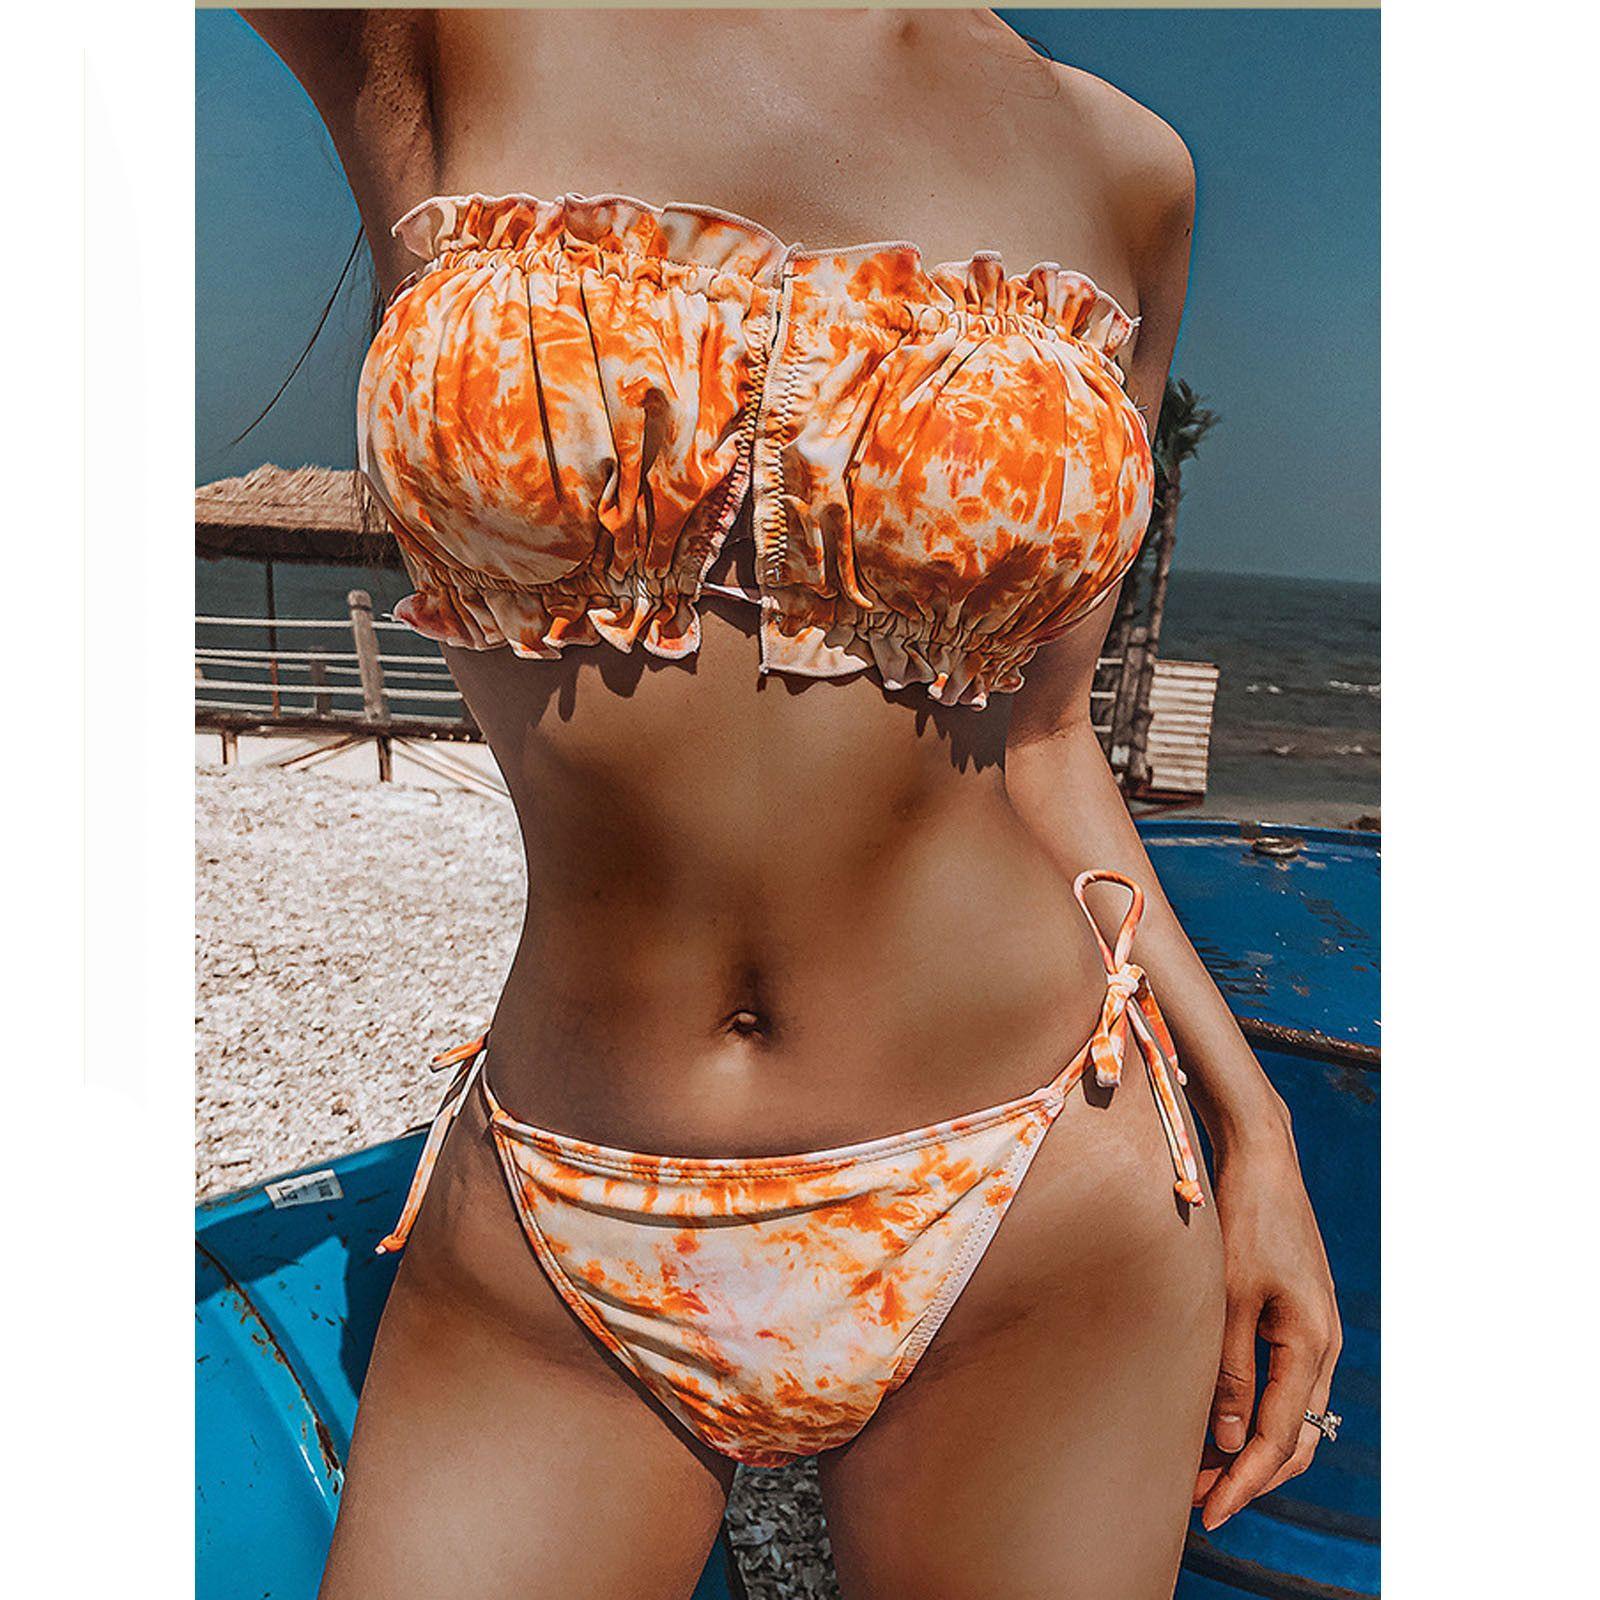 Bandeau Swimsuit Mulheres Bikini Set New Top Sexy Lady Bandage Bikini Set Push-up Brasileiro Swimwear Beachwear Swimsuit Feminino Q1230